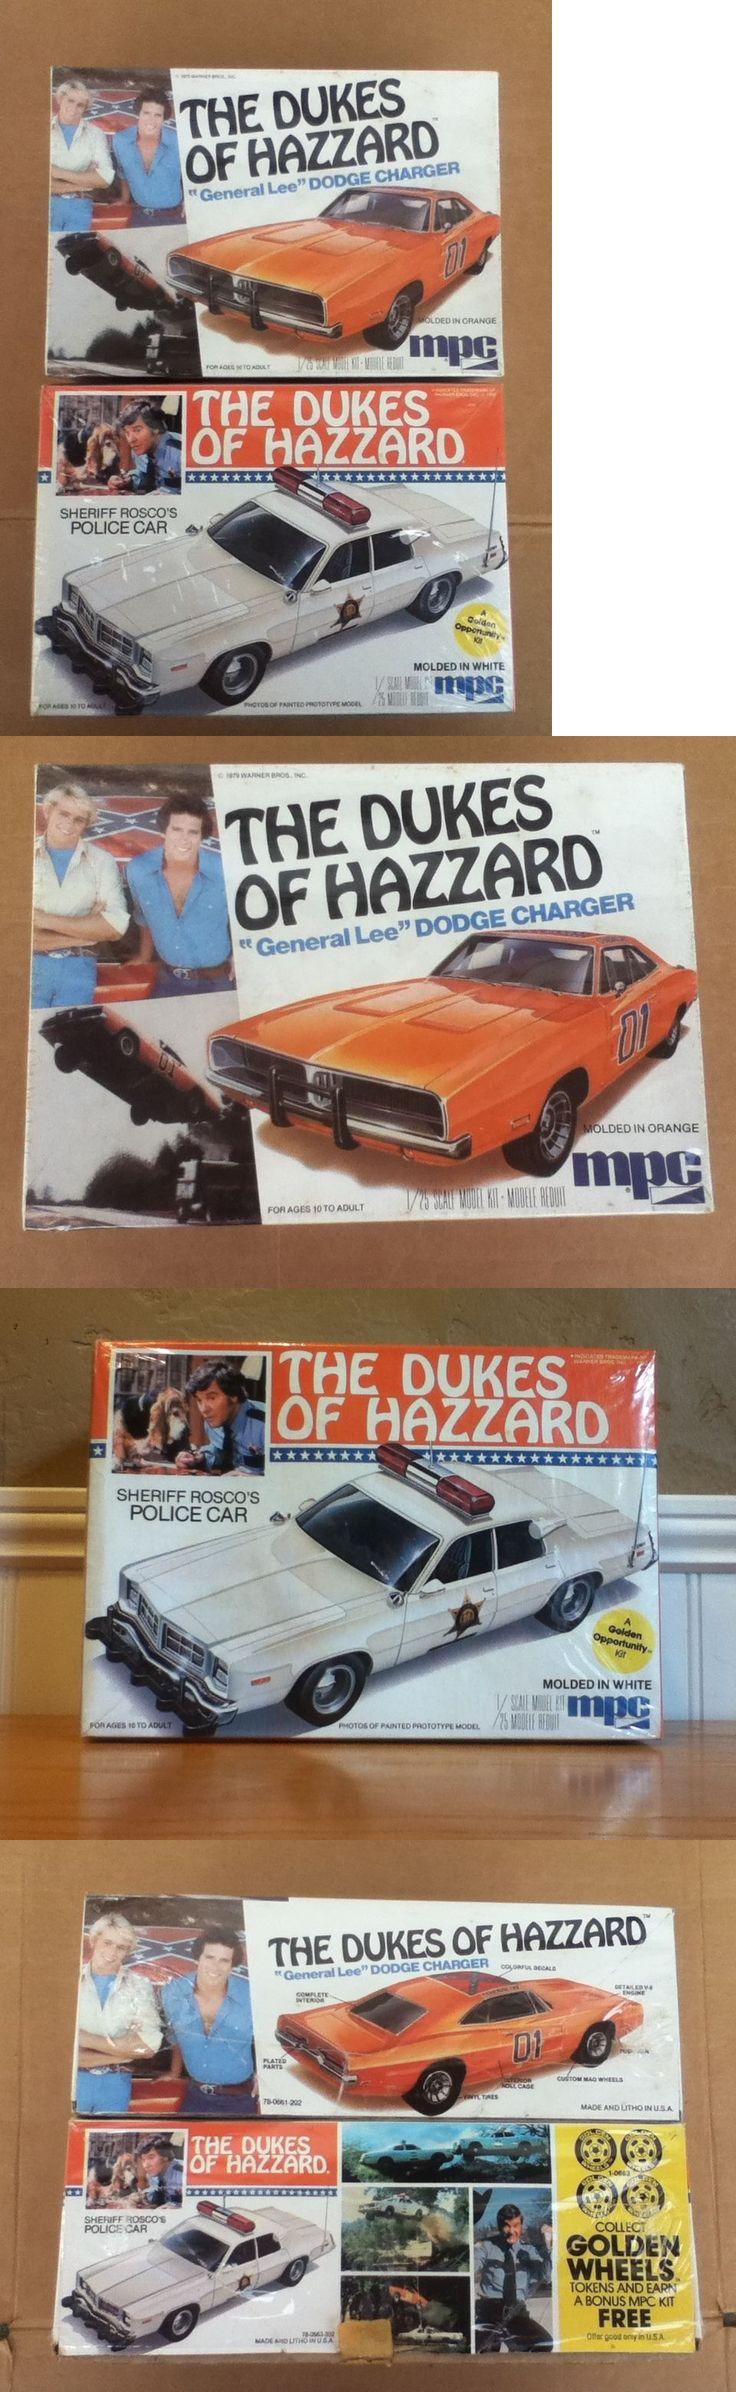 Dukes of Hazzard 20908: Vintage Original Dukes Of Hazzard General Lee Rosco Police Car 1 25 Model Kits -> BUY IT NOW ONLY: $59 on eBay!